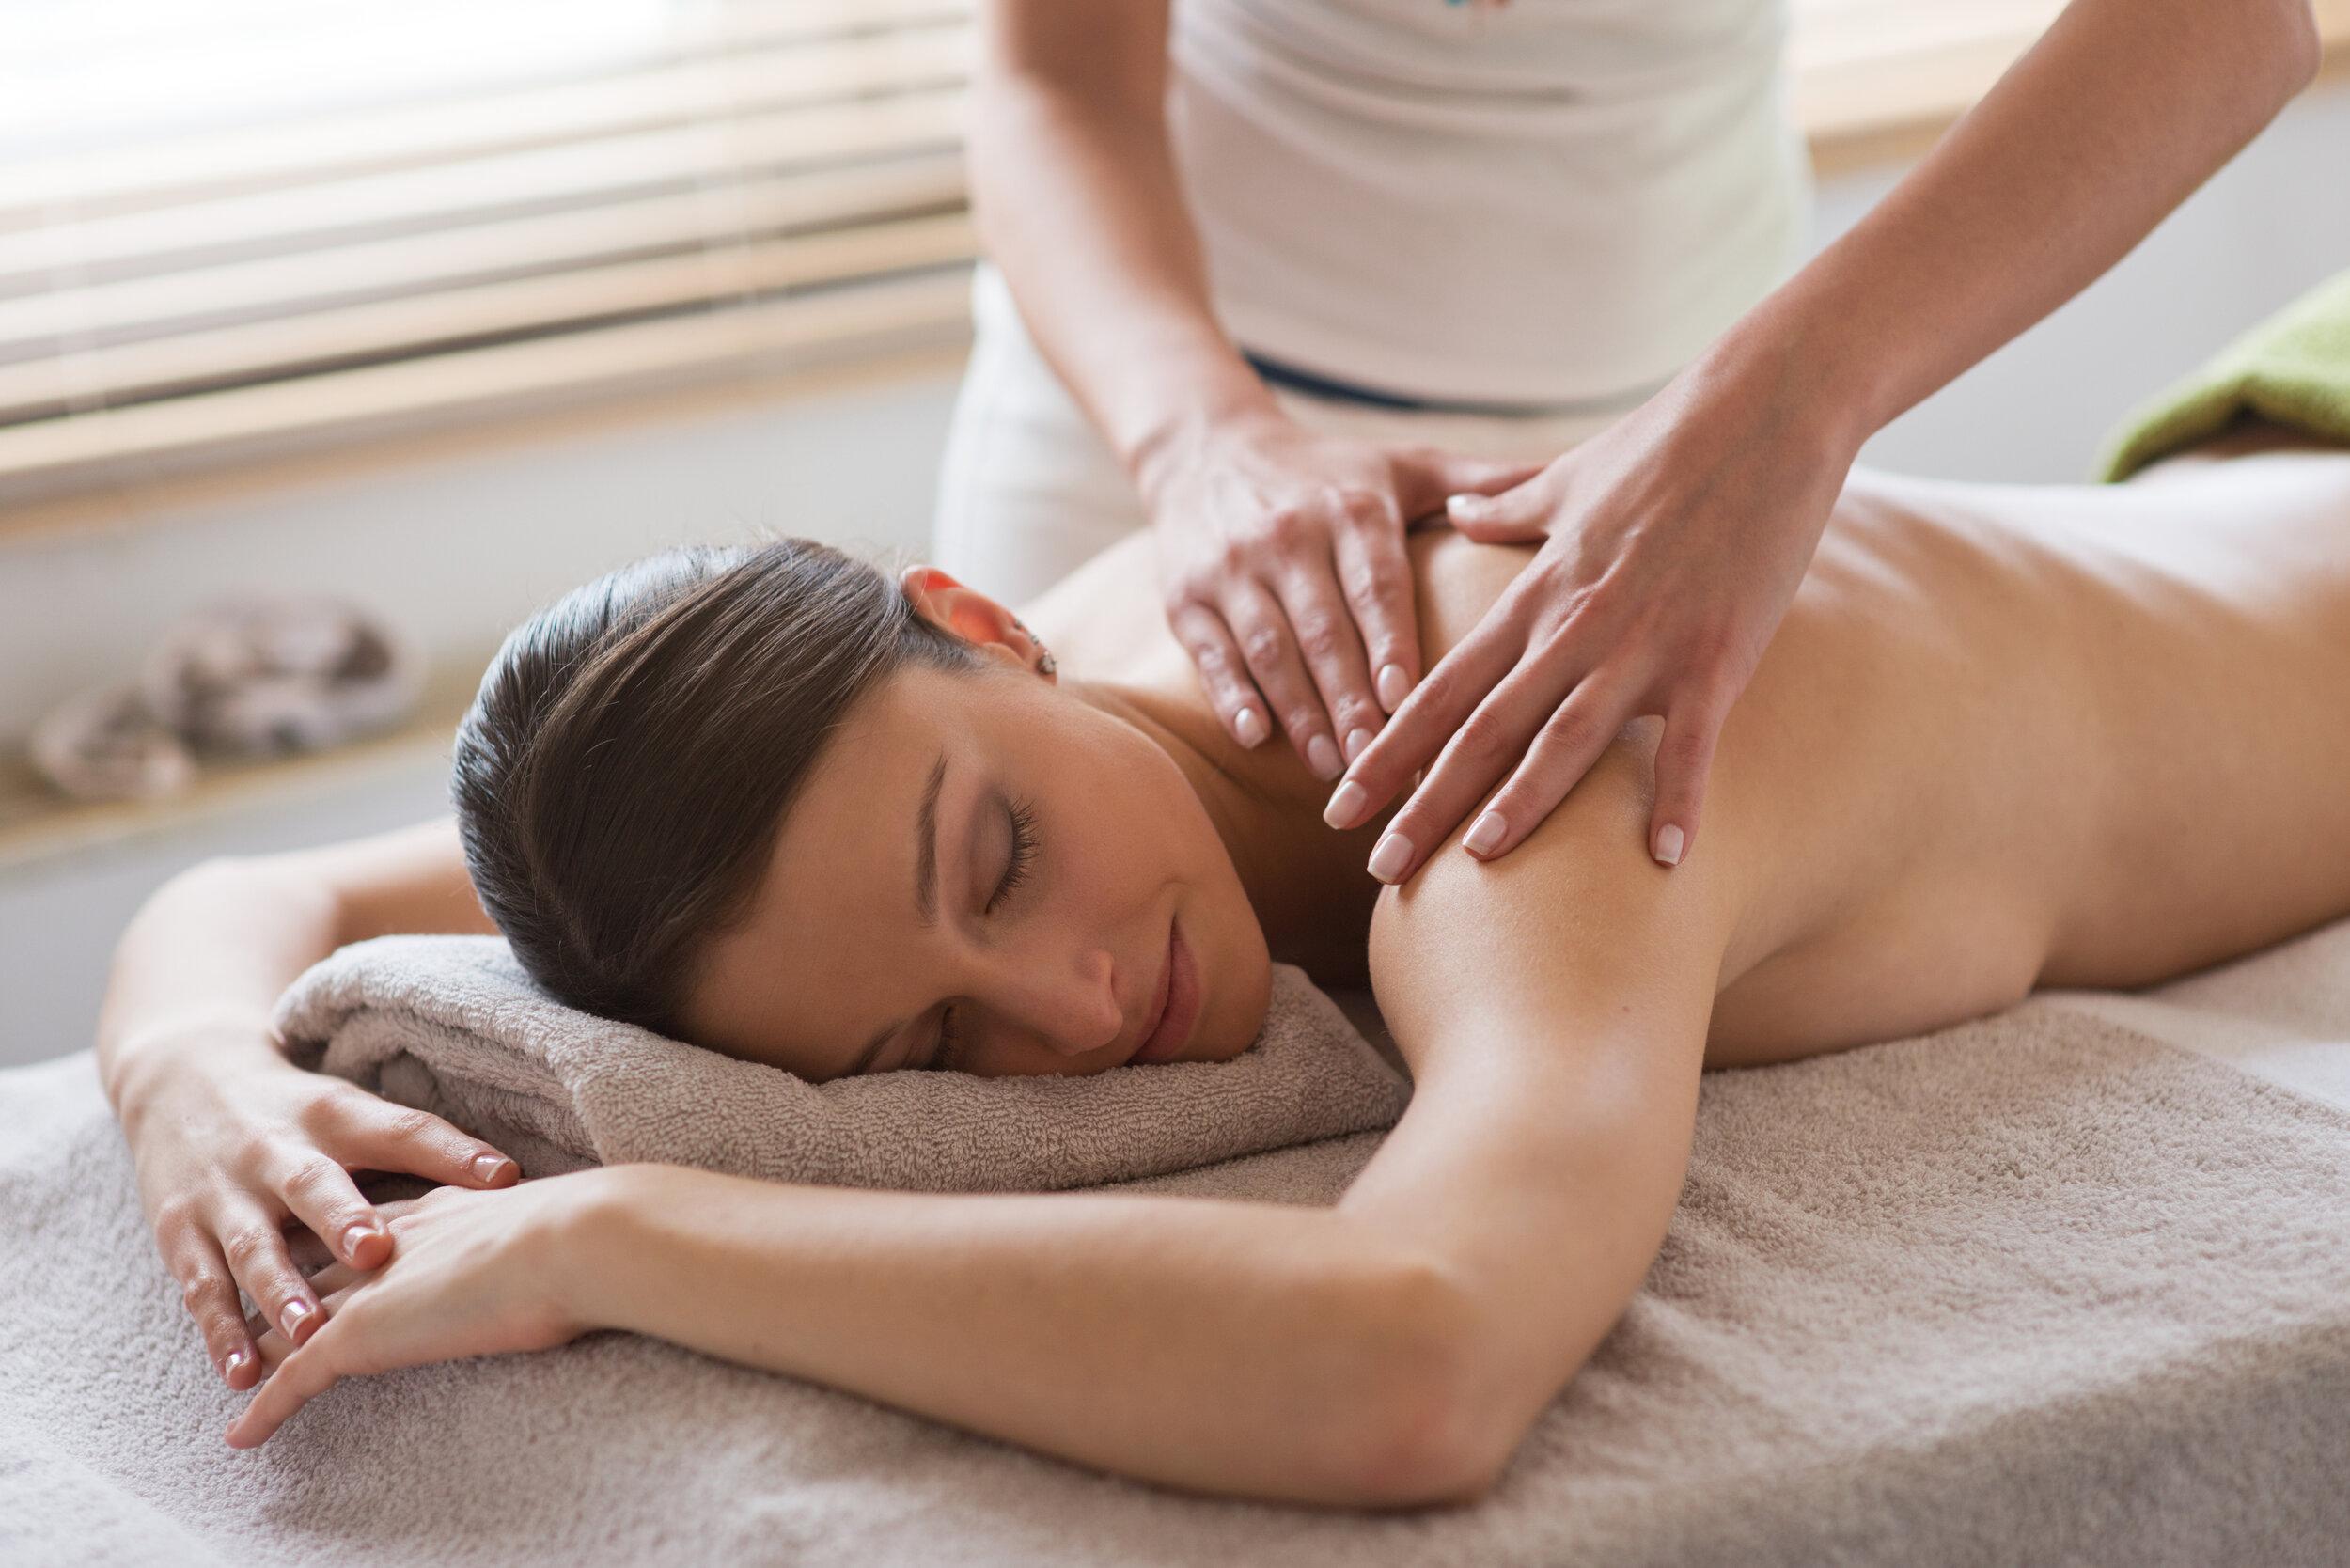 Wereld massage bourgeois-marsolais.com :